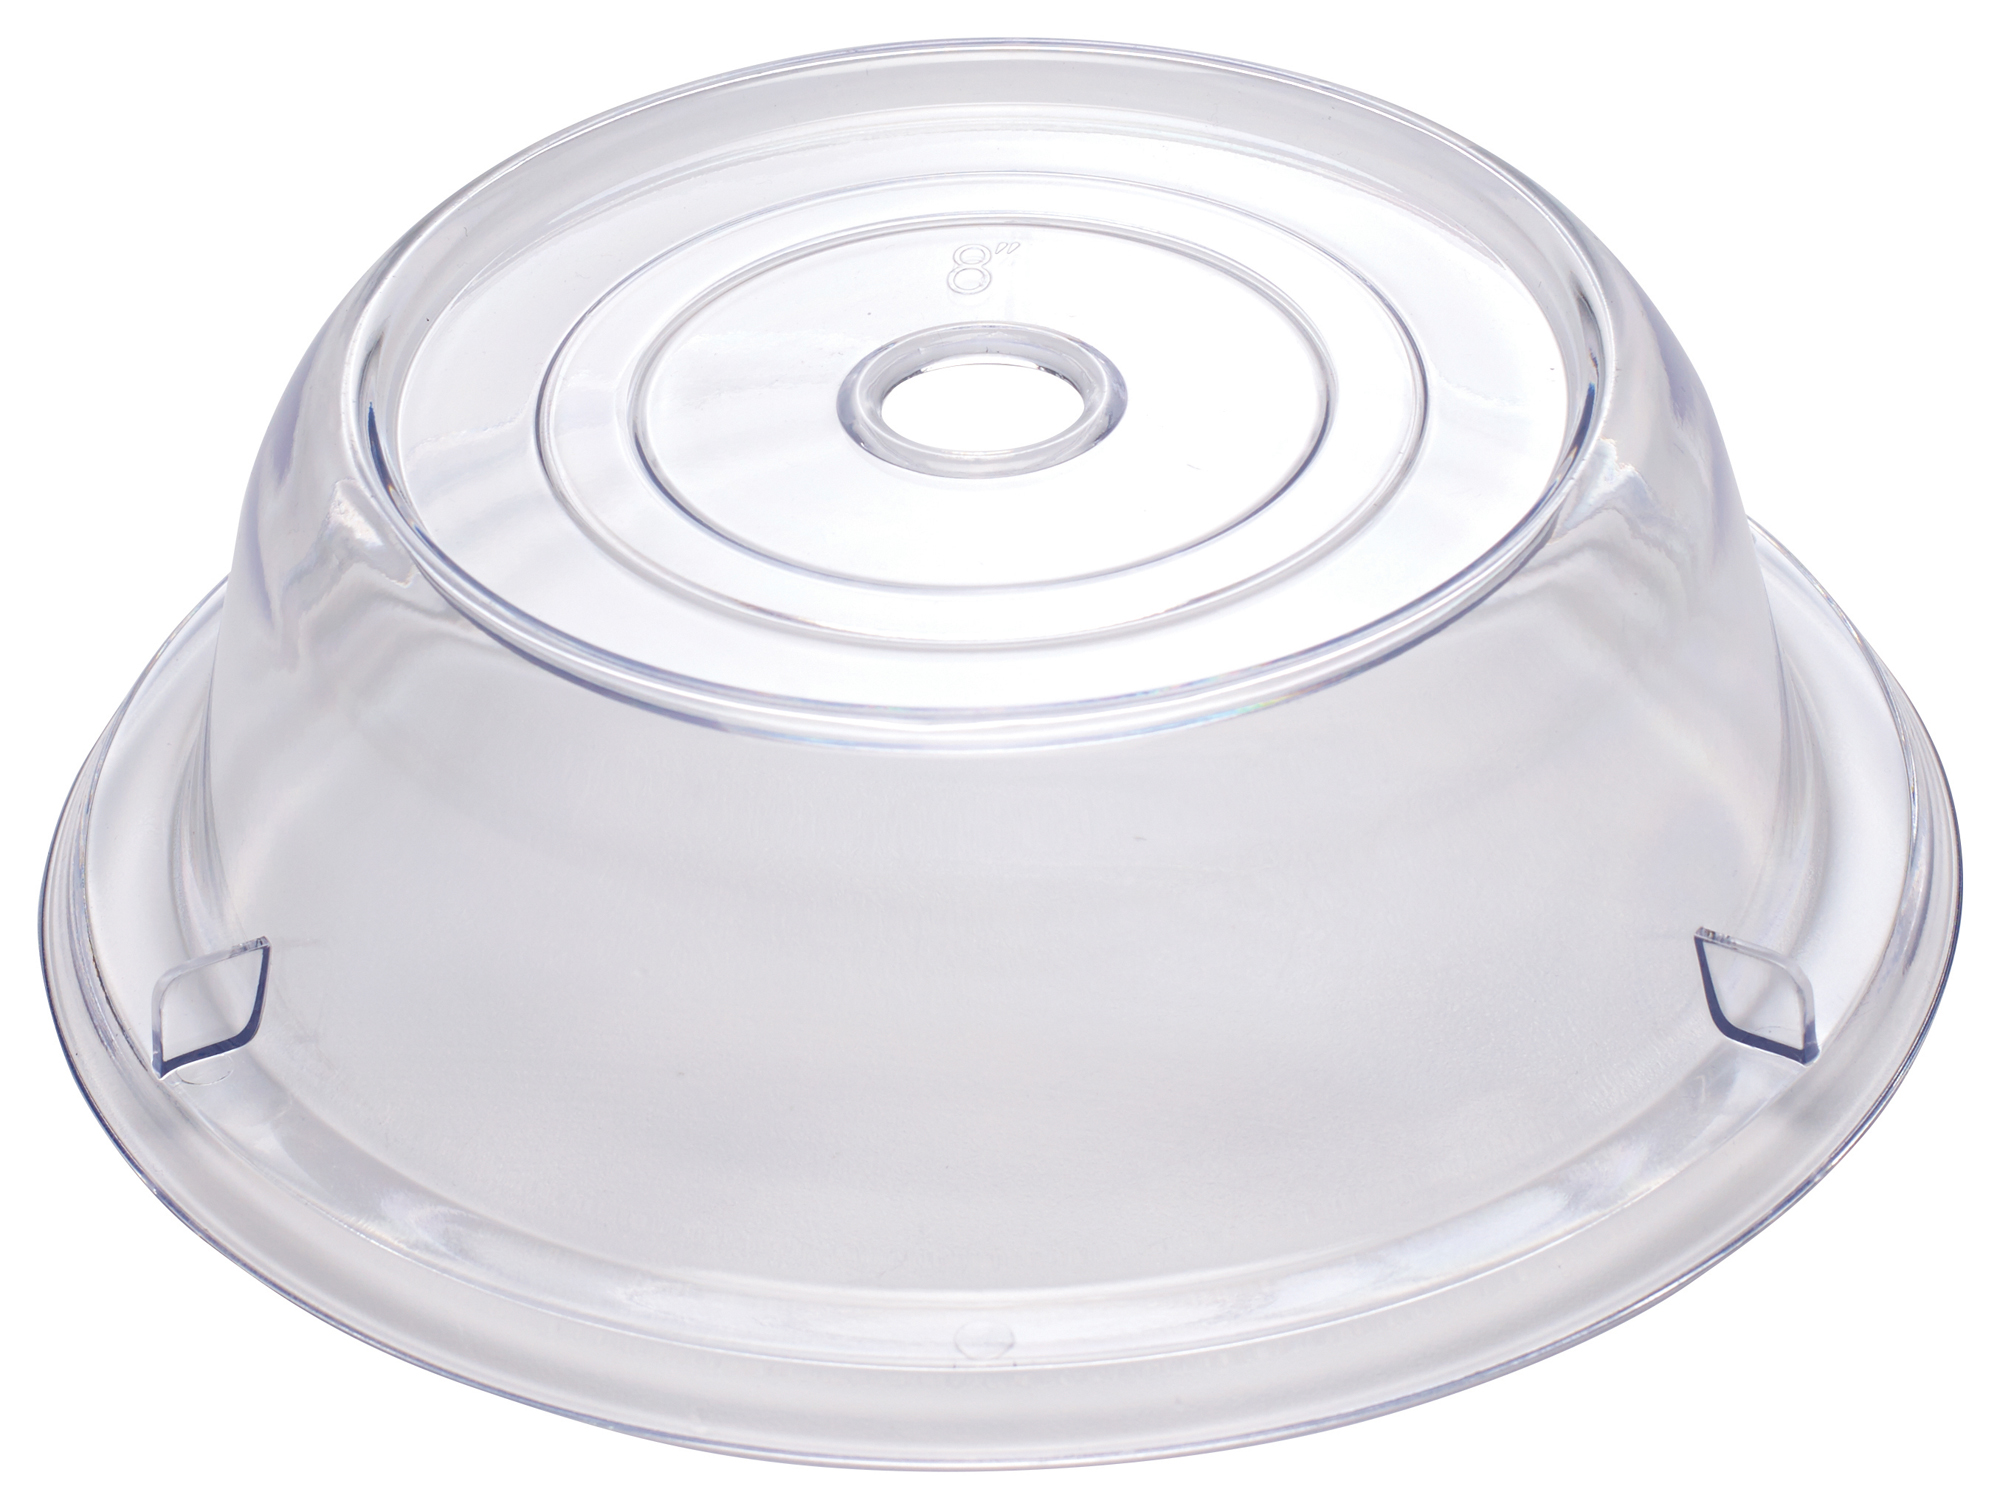 Winco PPCR-8 round plate cover